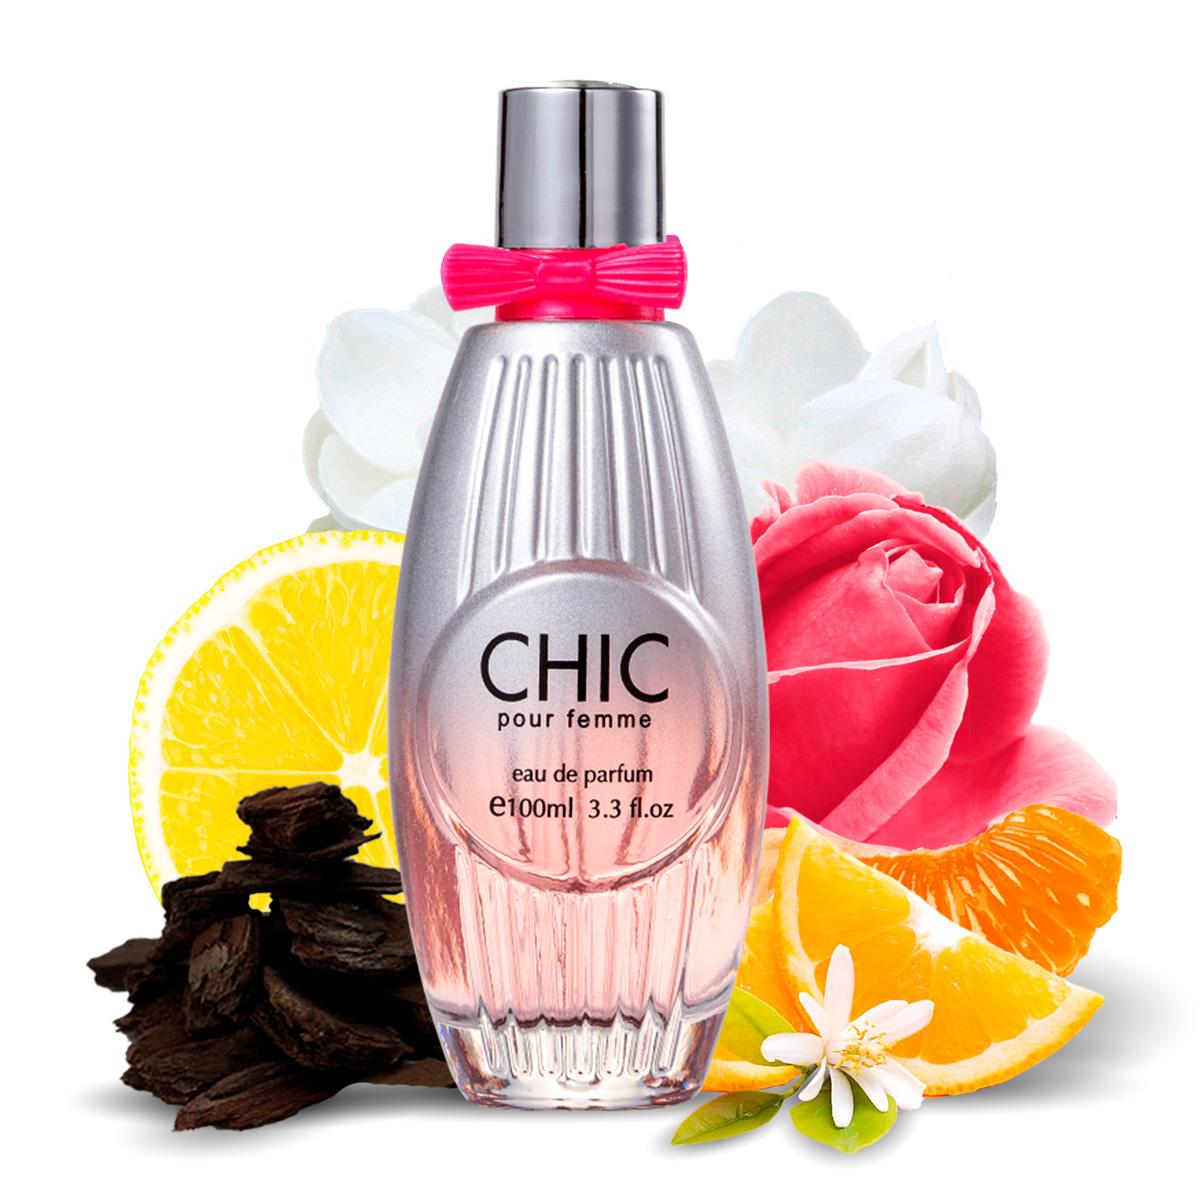 Kit 2 Perfumes Importados Chic e Conquer I Scents